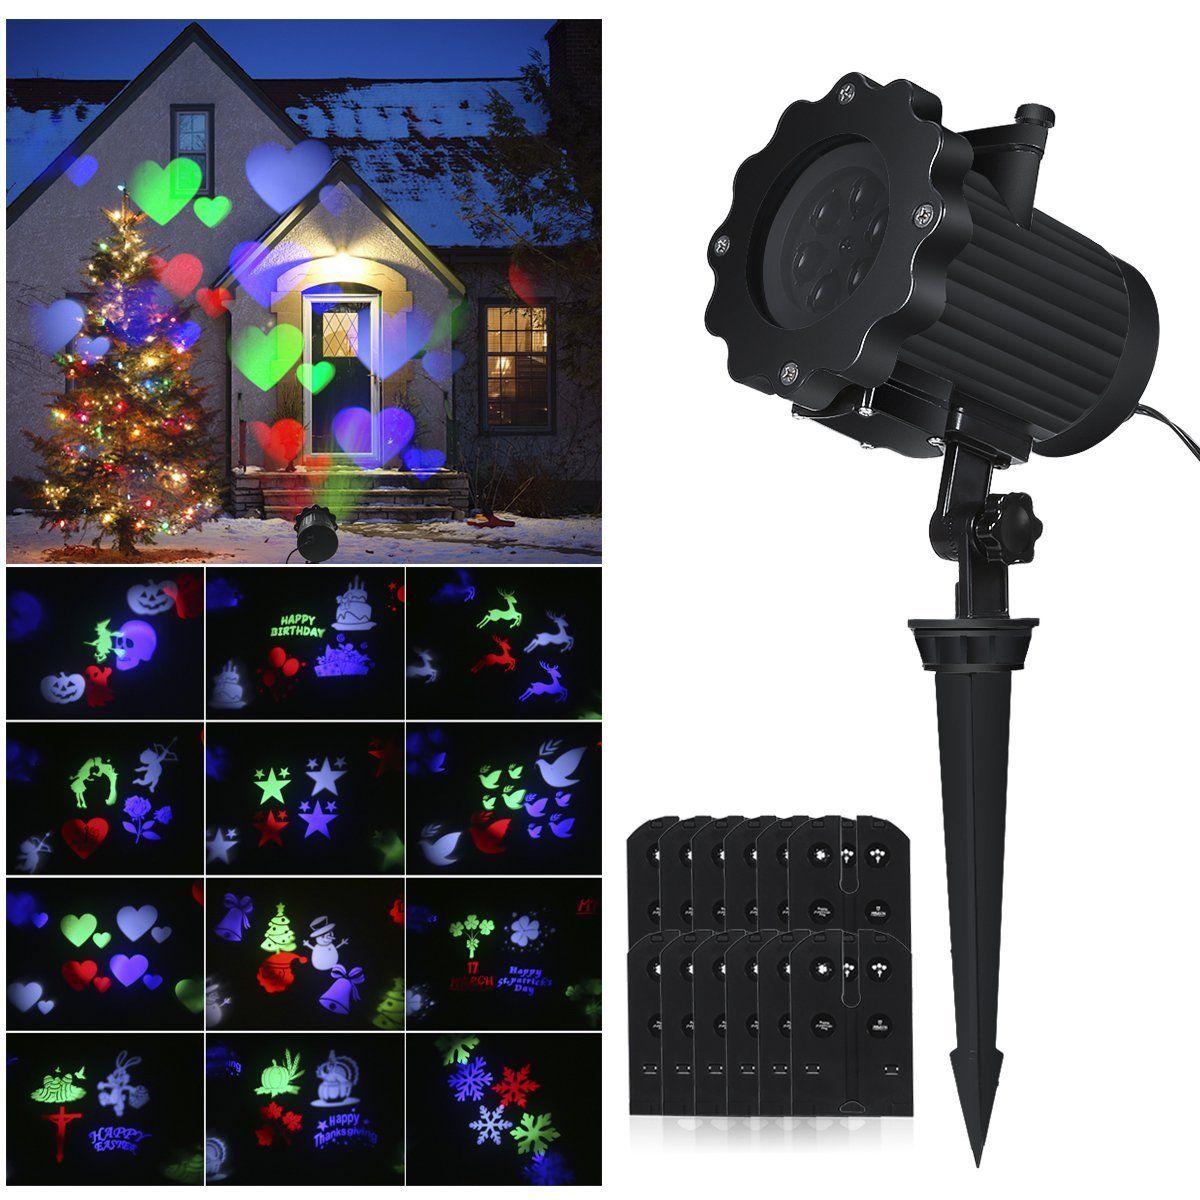 Christmas Light Projector.2019 Led Christmas Light Projector Outdoor Rotating Light Projector Snowflake Spotlight 12 Patterns Sparkling Landscape Light Show For Wedding From